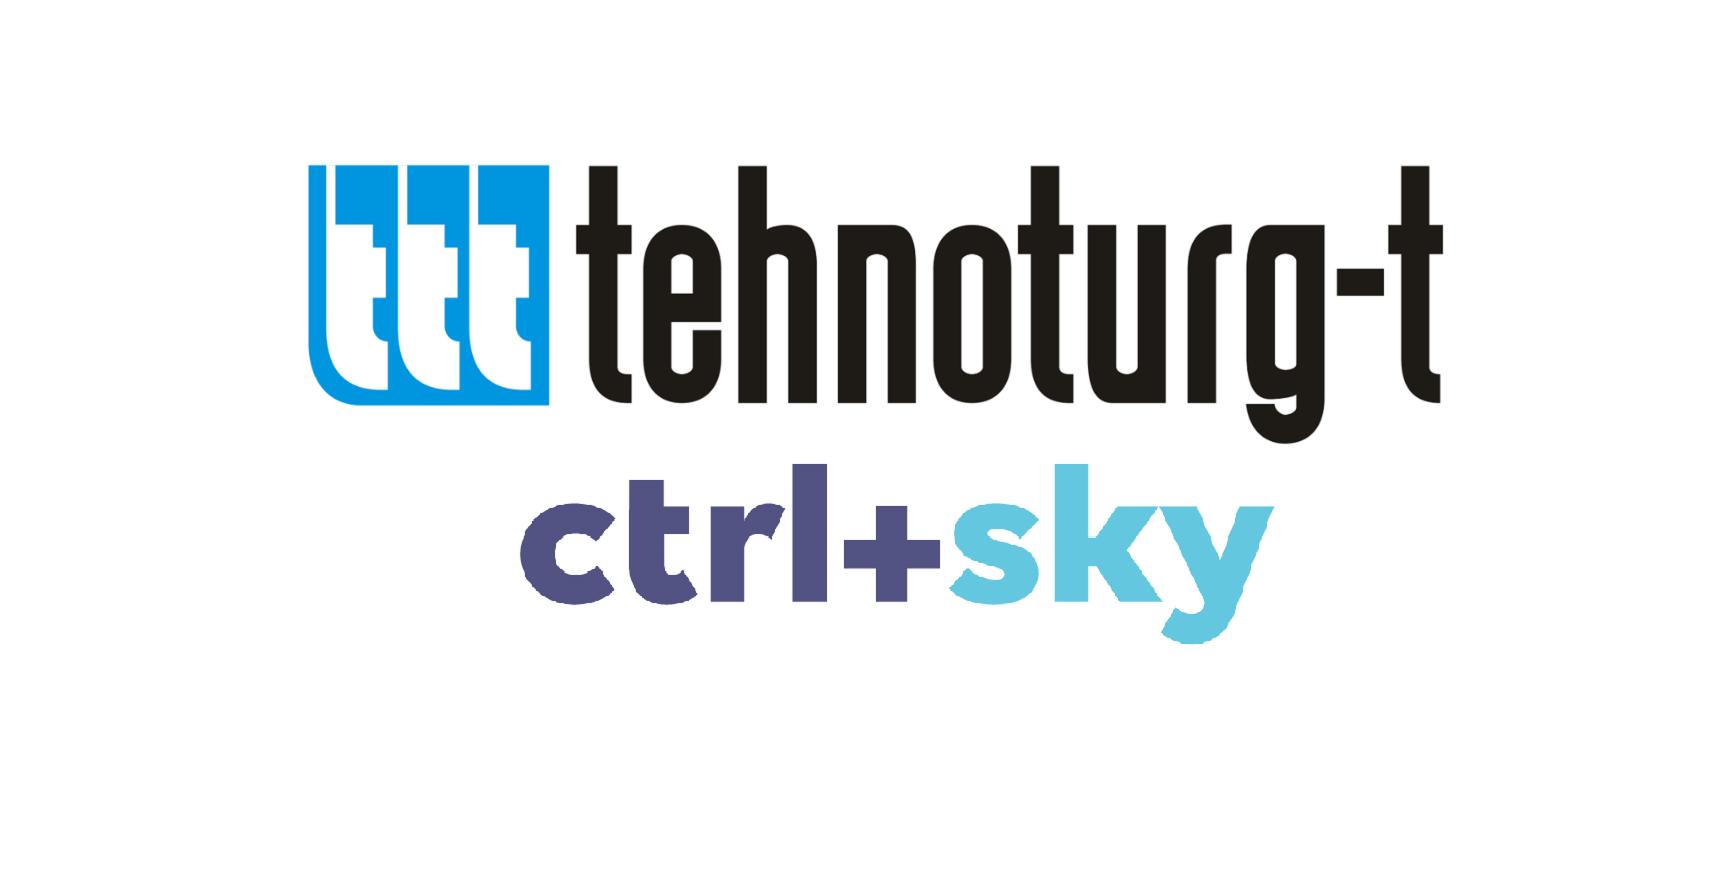 Technoturg